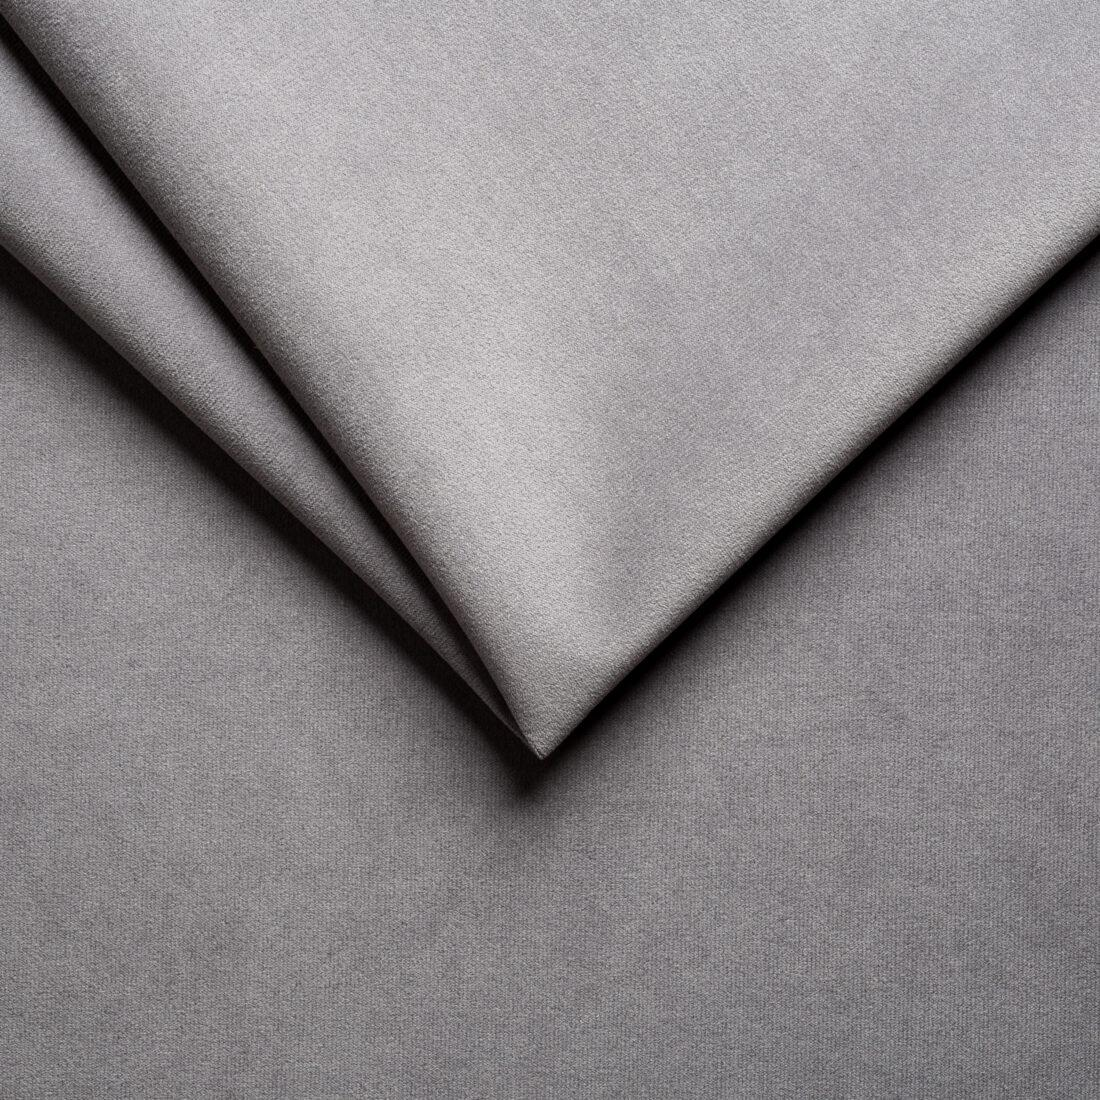 Мебельная ткань Laura 33 Ash, велюр